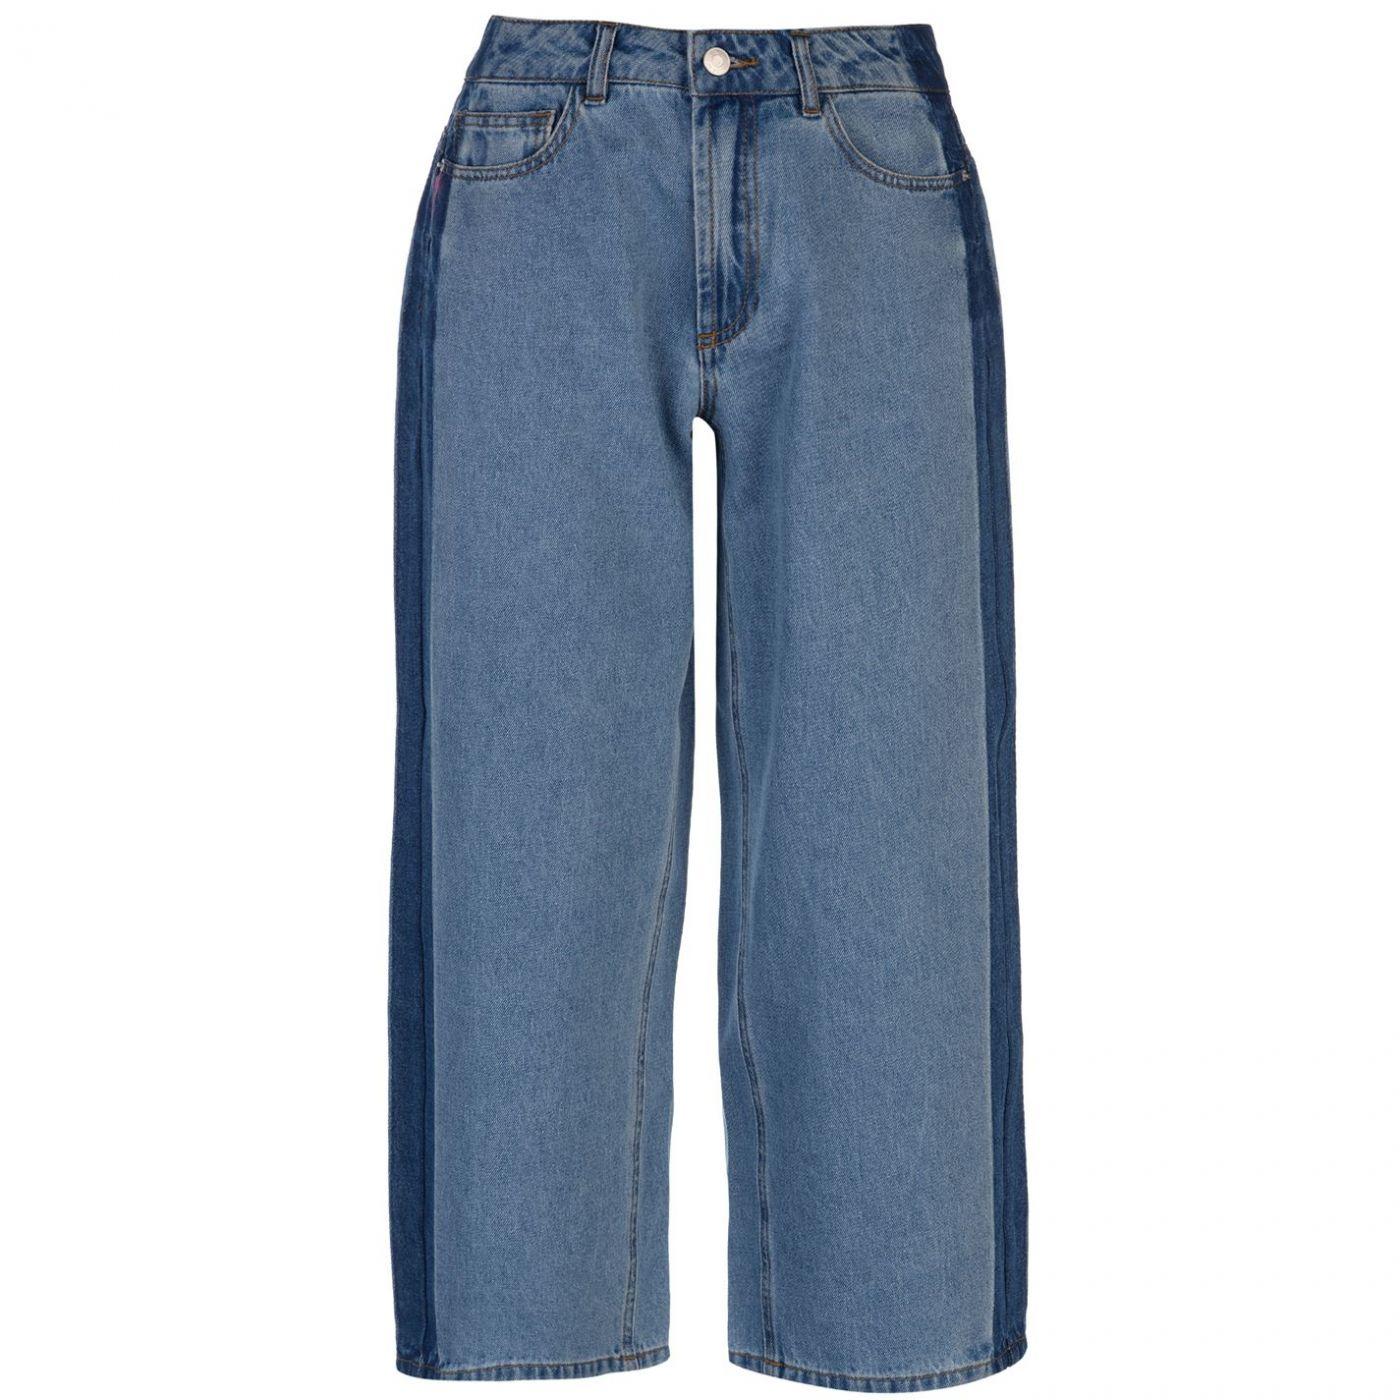 JDY Celia Cropped Womens Jeans